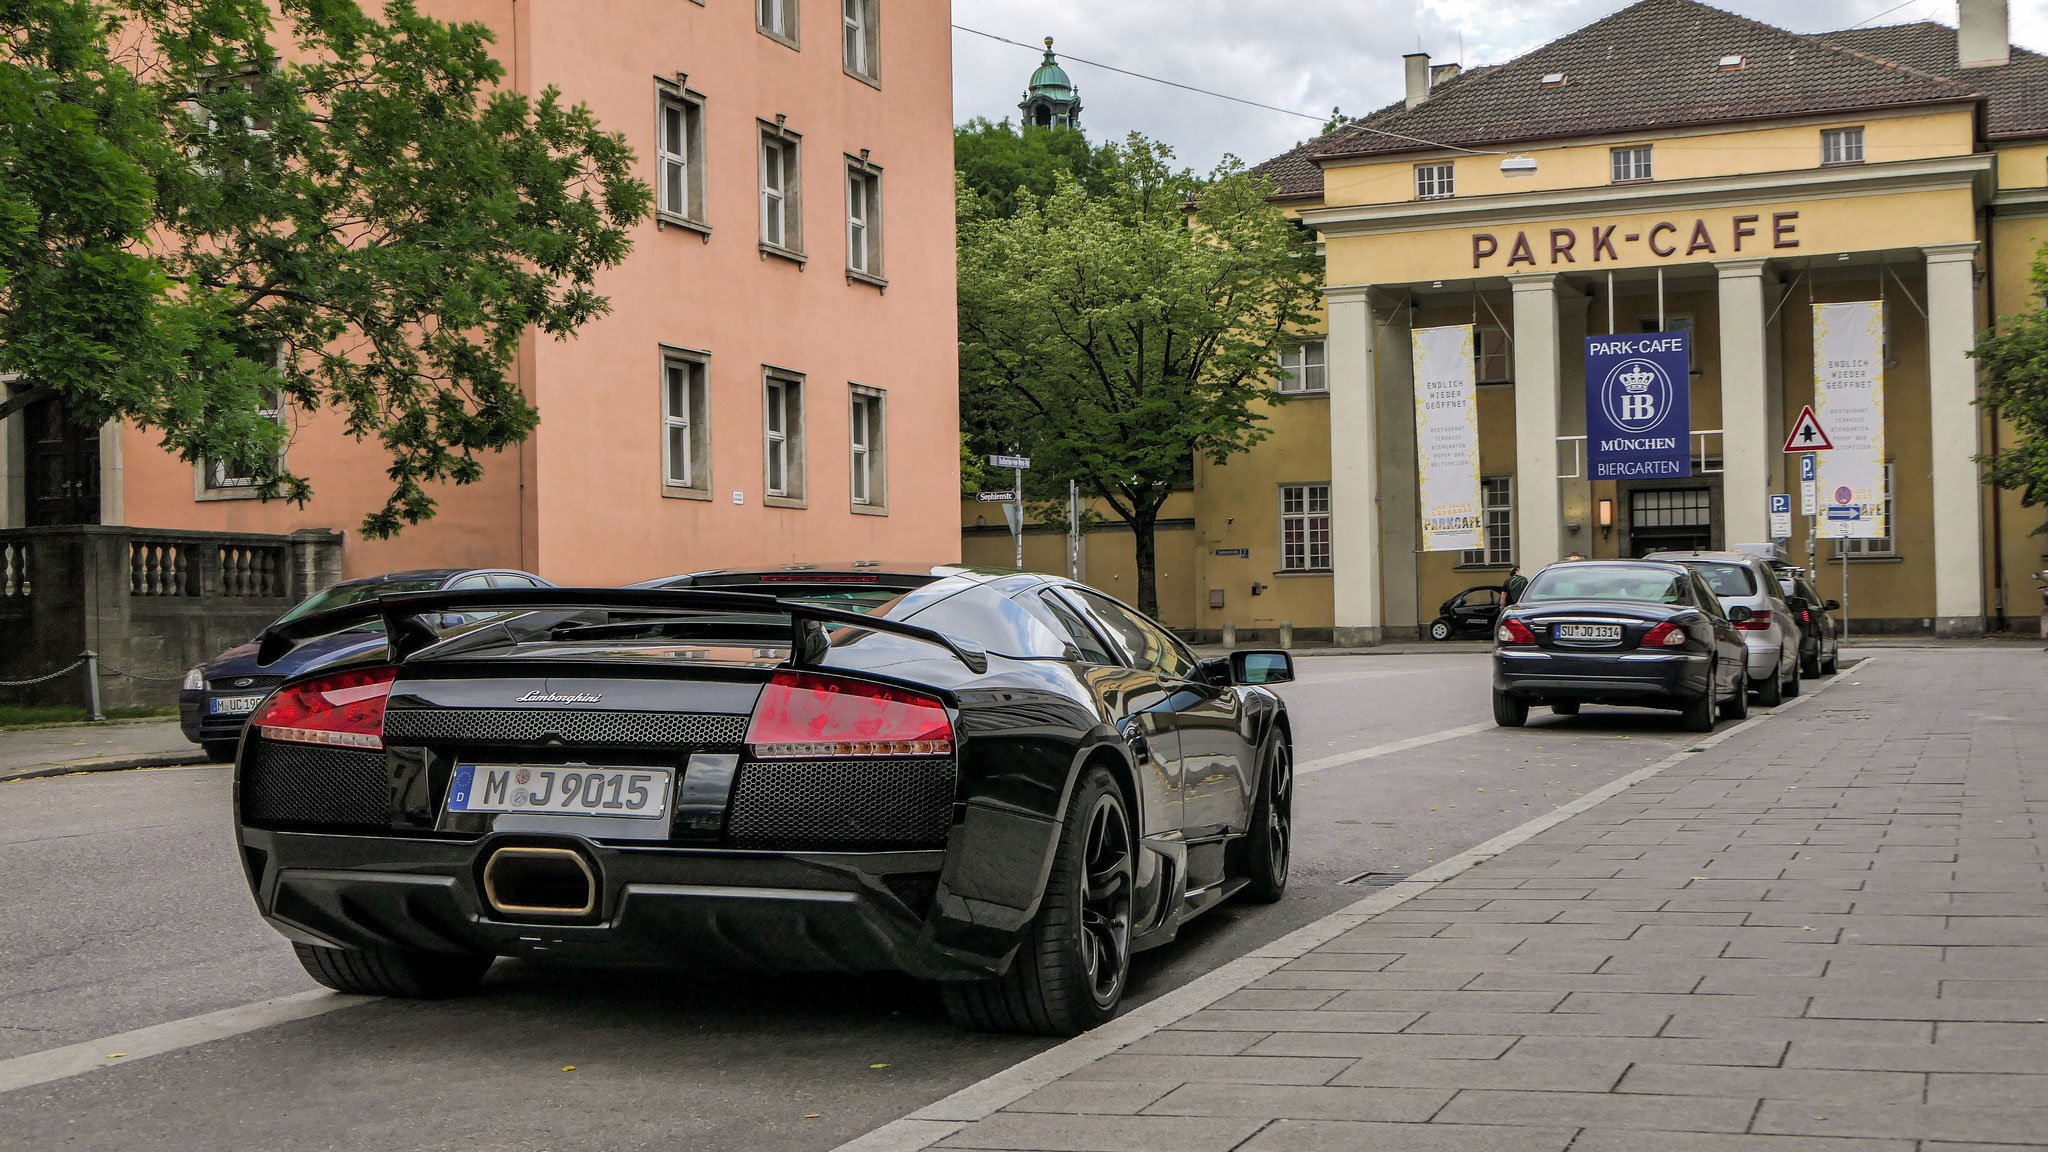 Lamborghini Murcielago Le Mans - M-J-9015